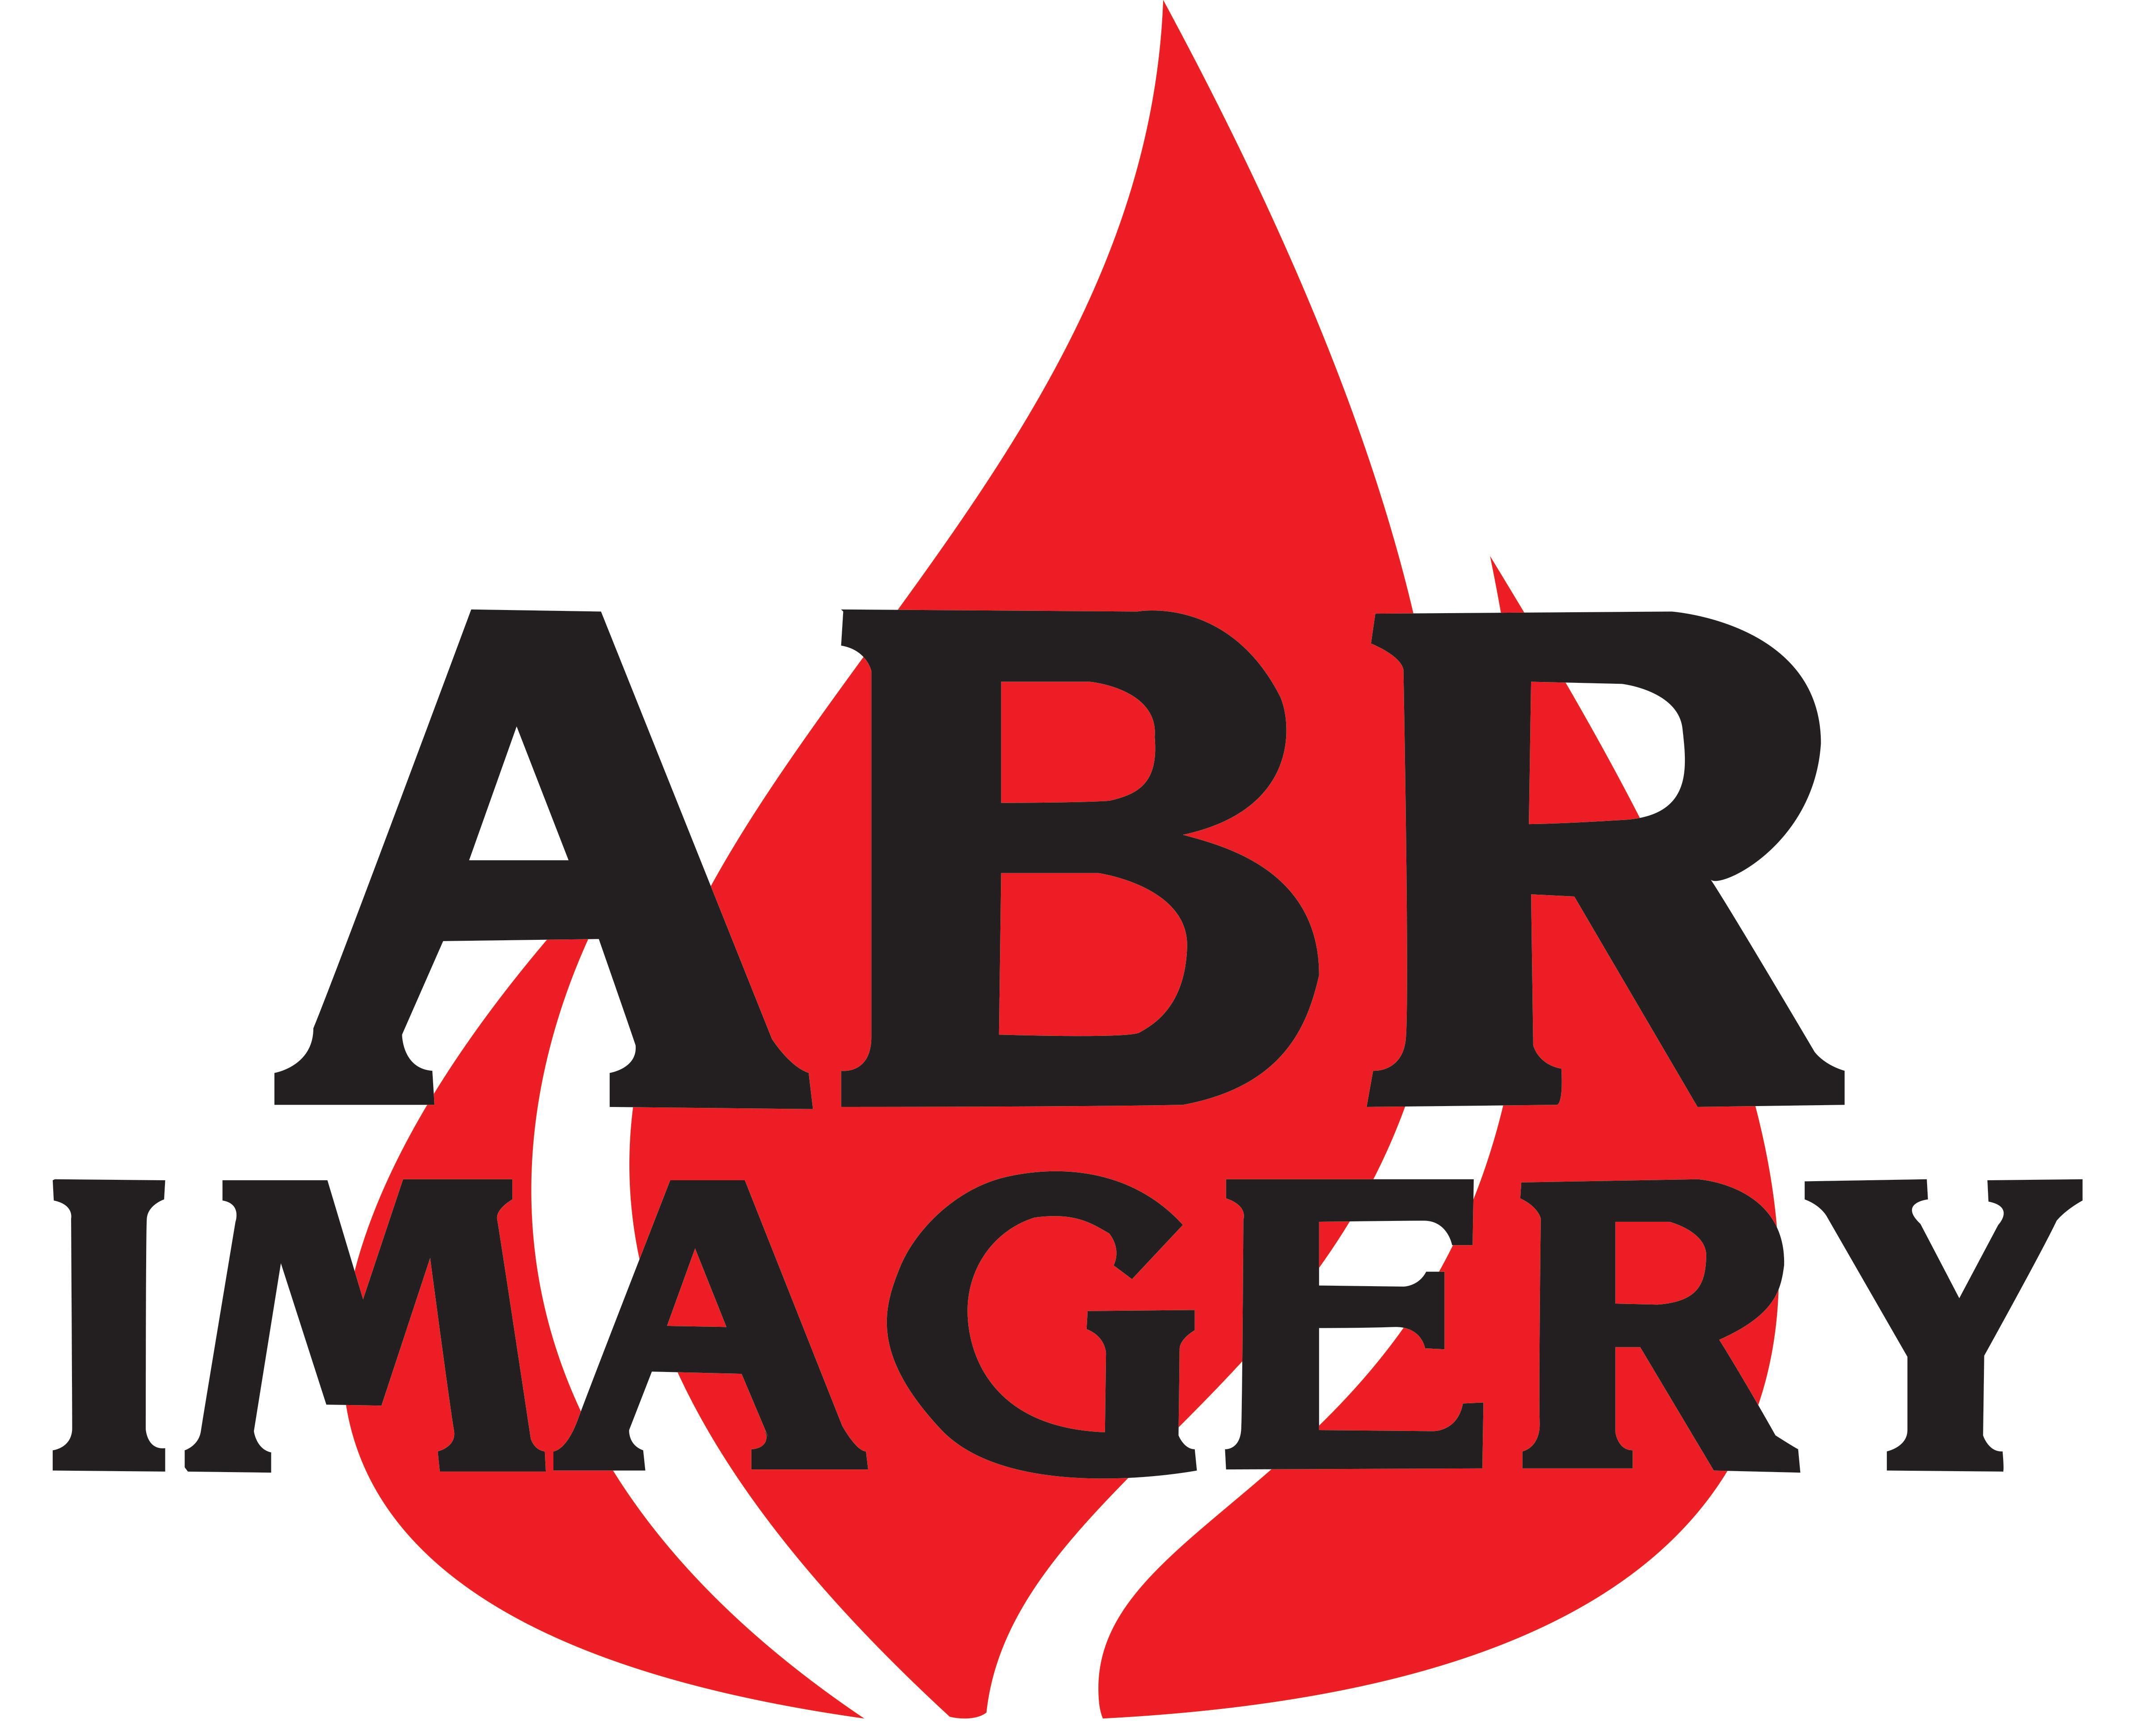 ABR_Imagery_logo